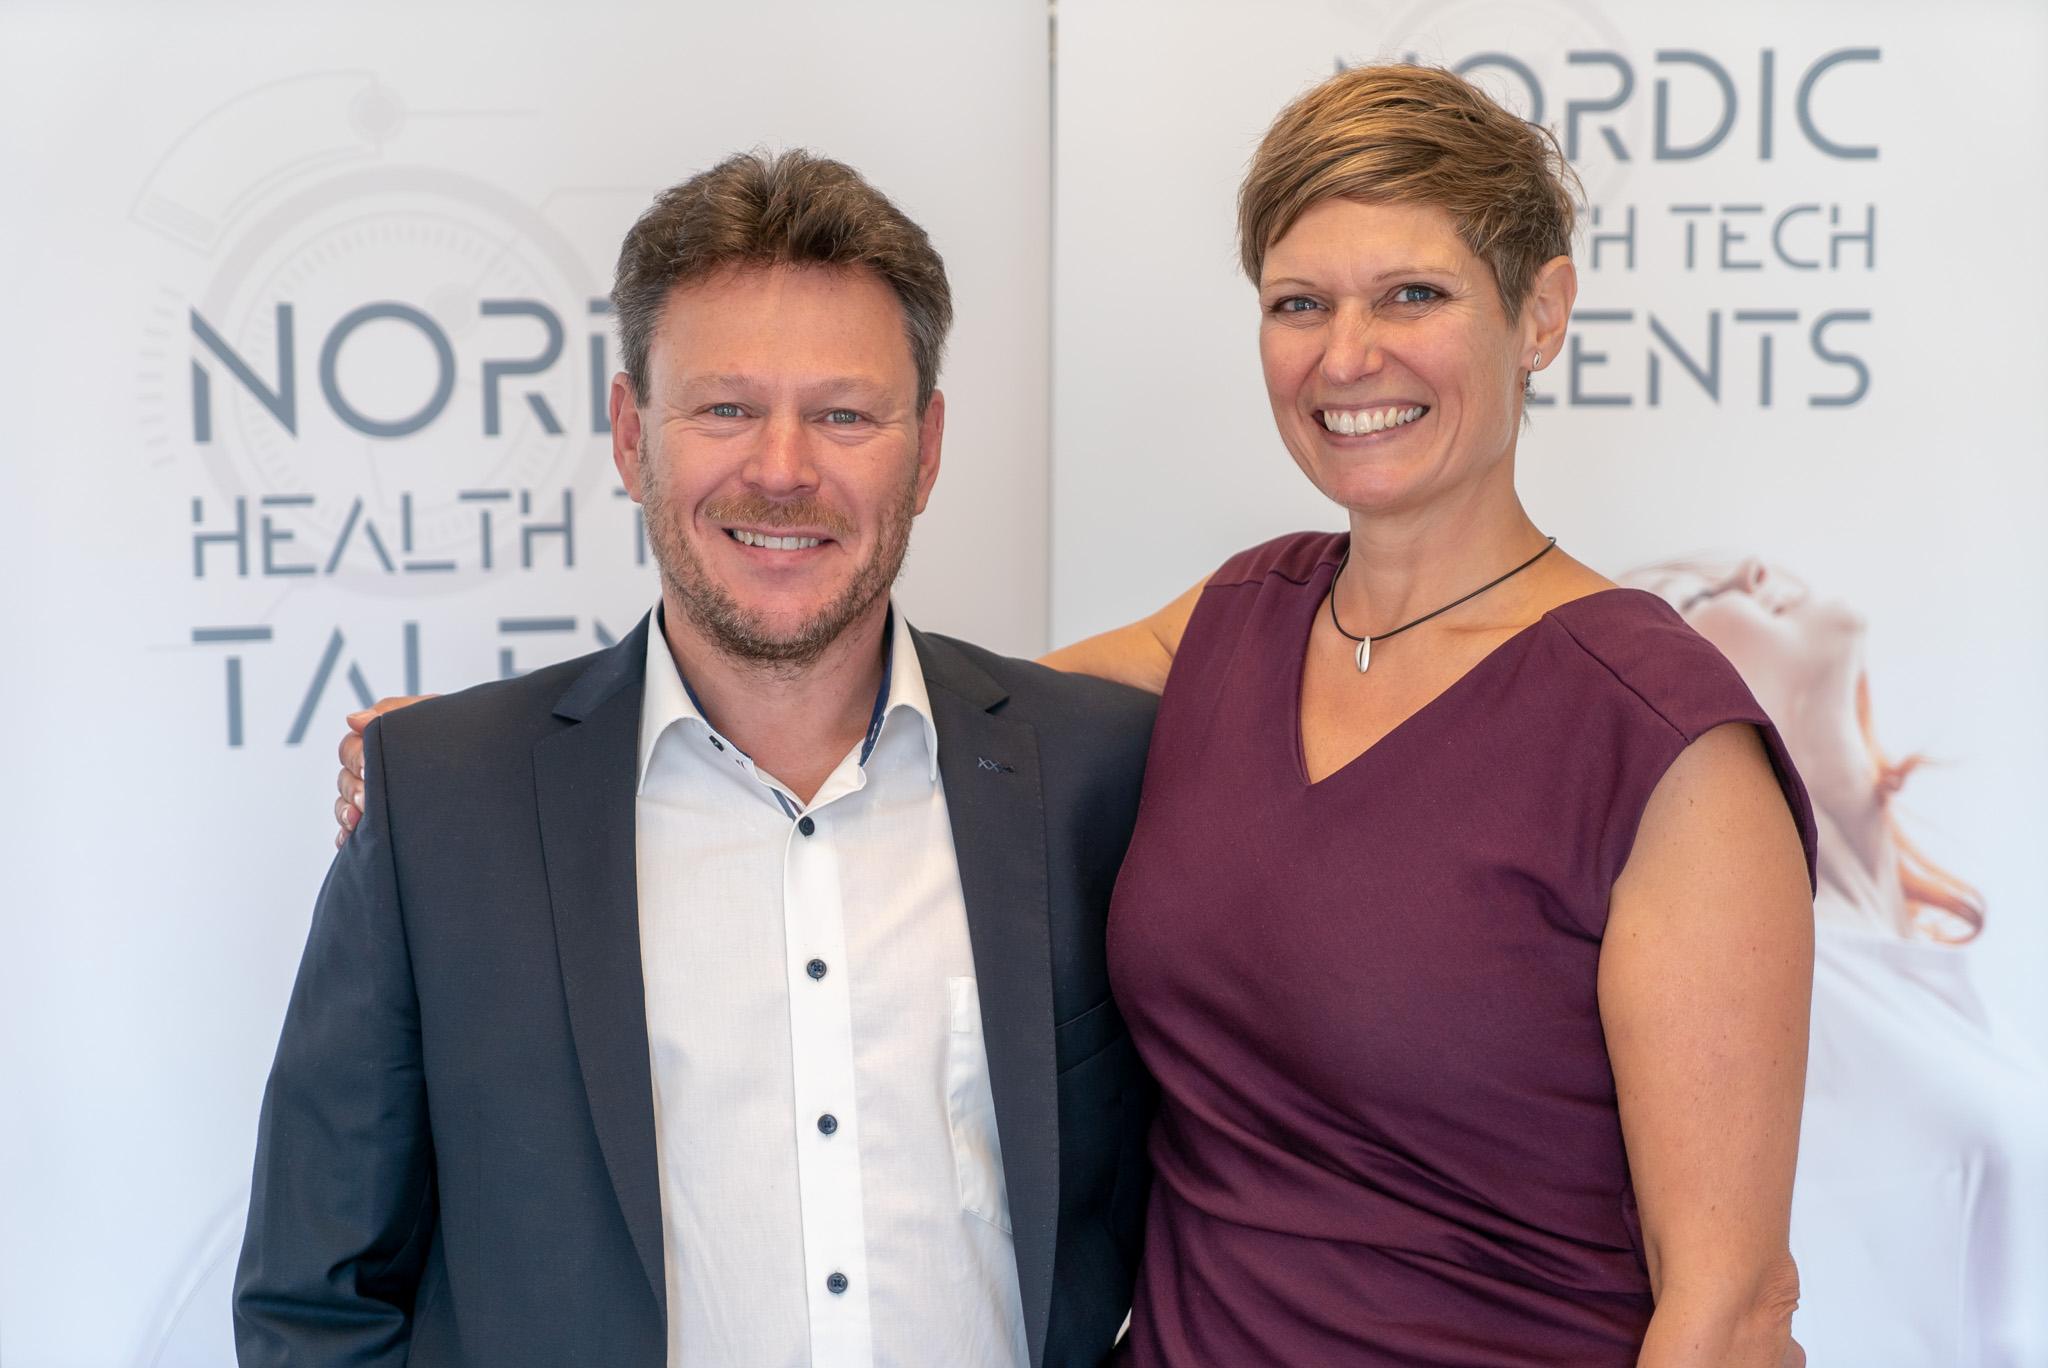 VasDeBlock Medical-Nordic HealthTech Talents 2018